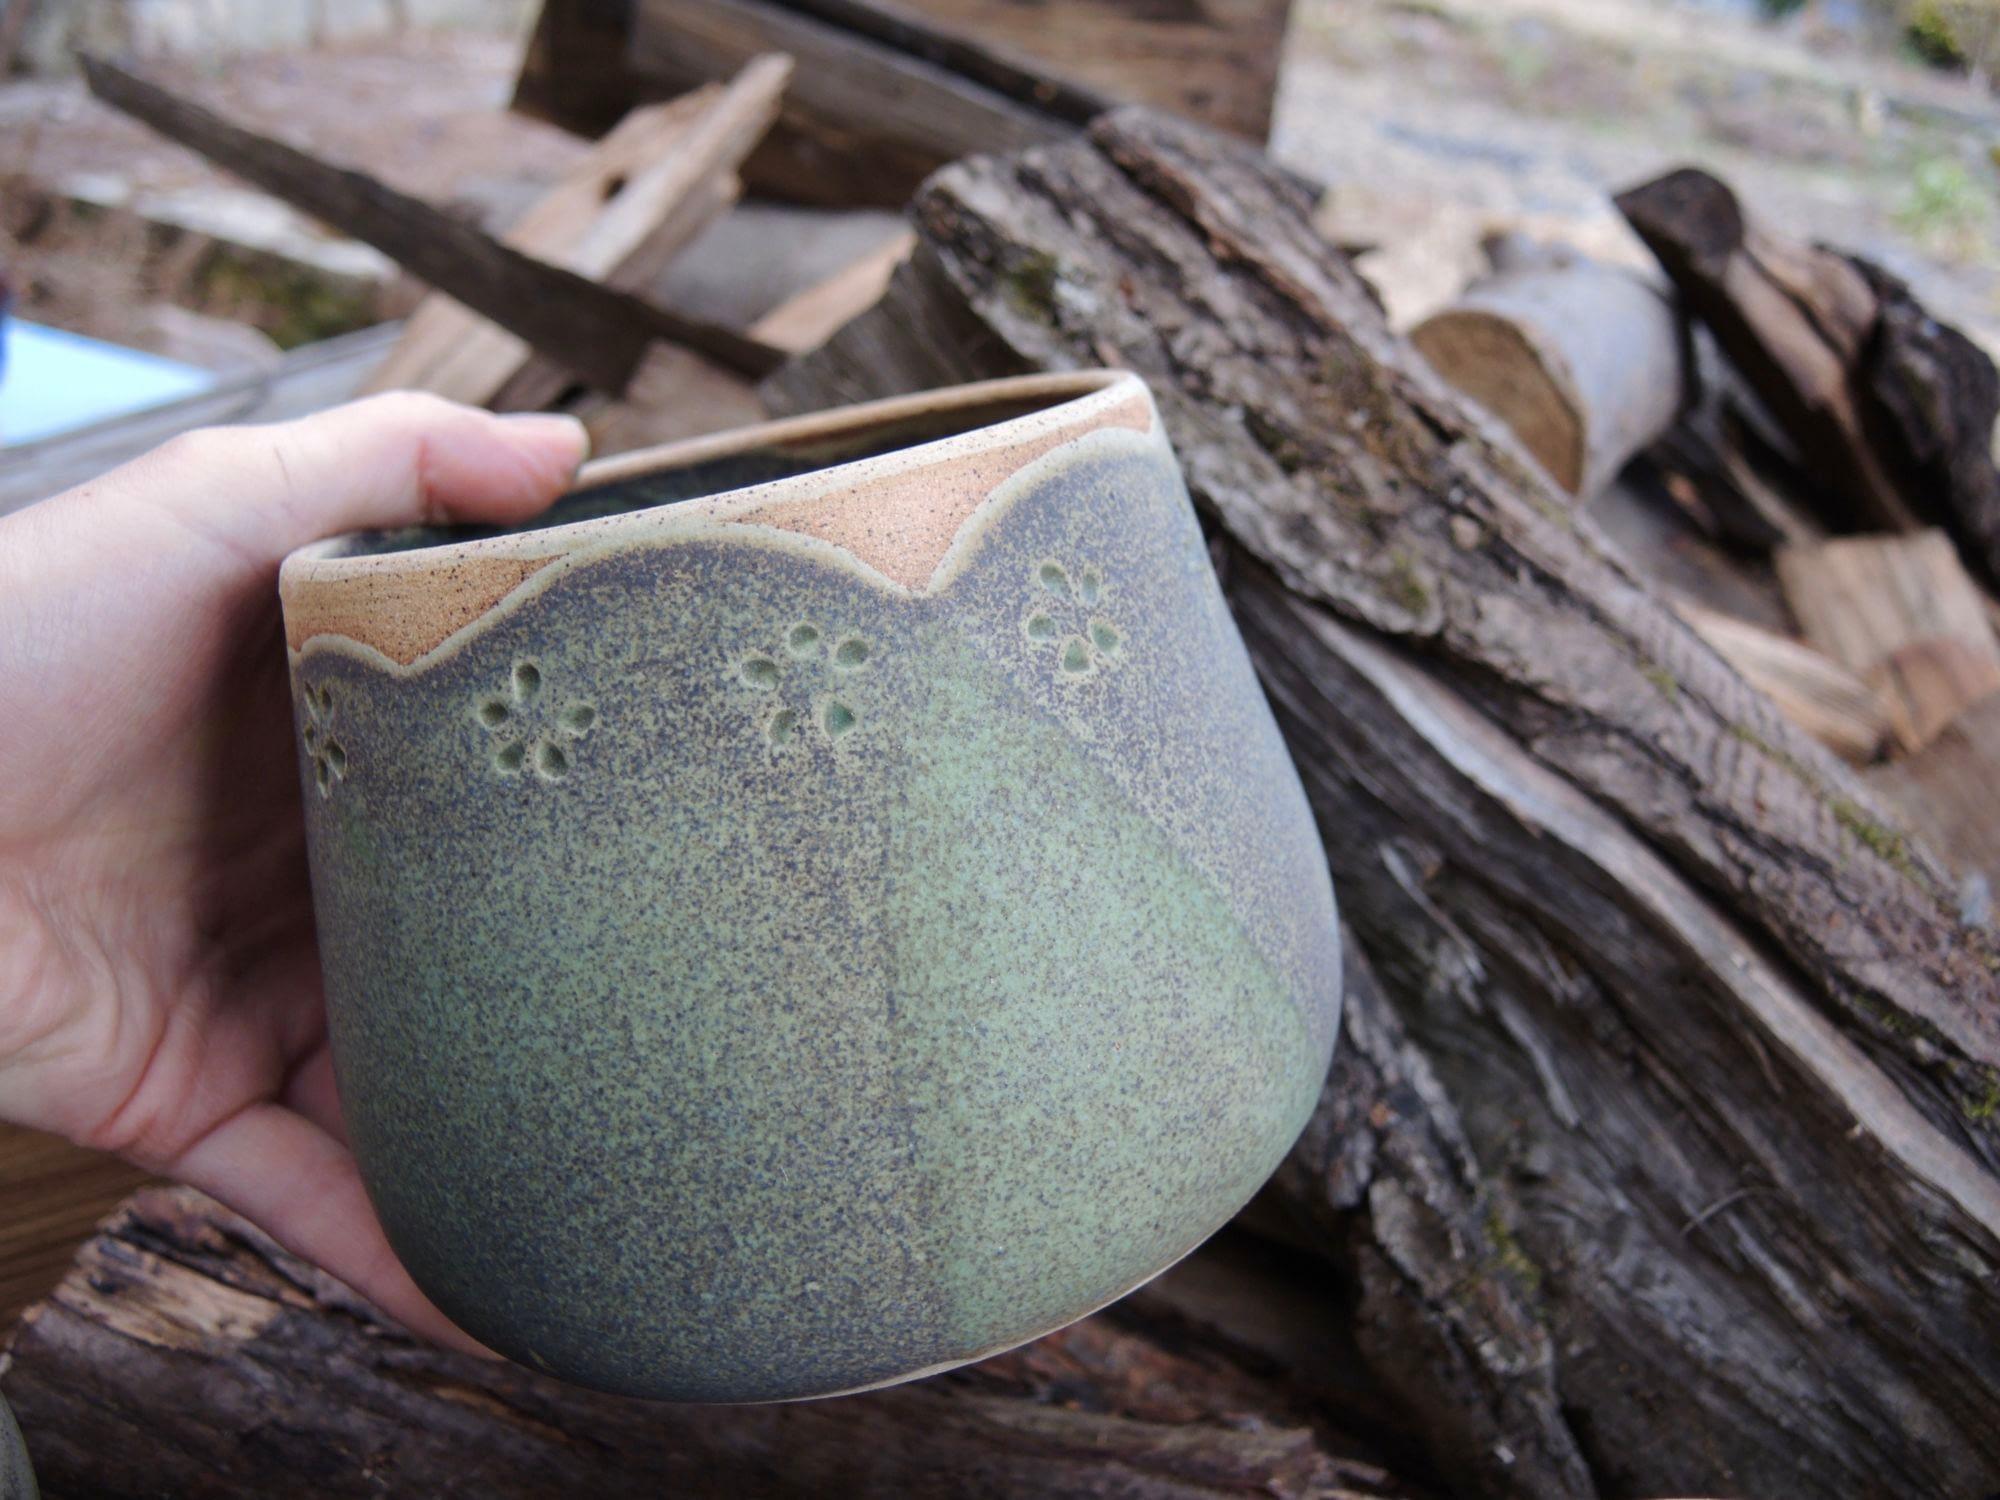 miska květináč bonsaj na kytky keramika zahrada keramikaandee